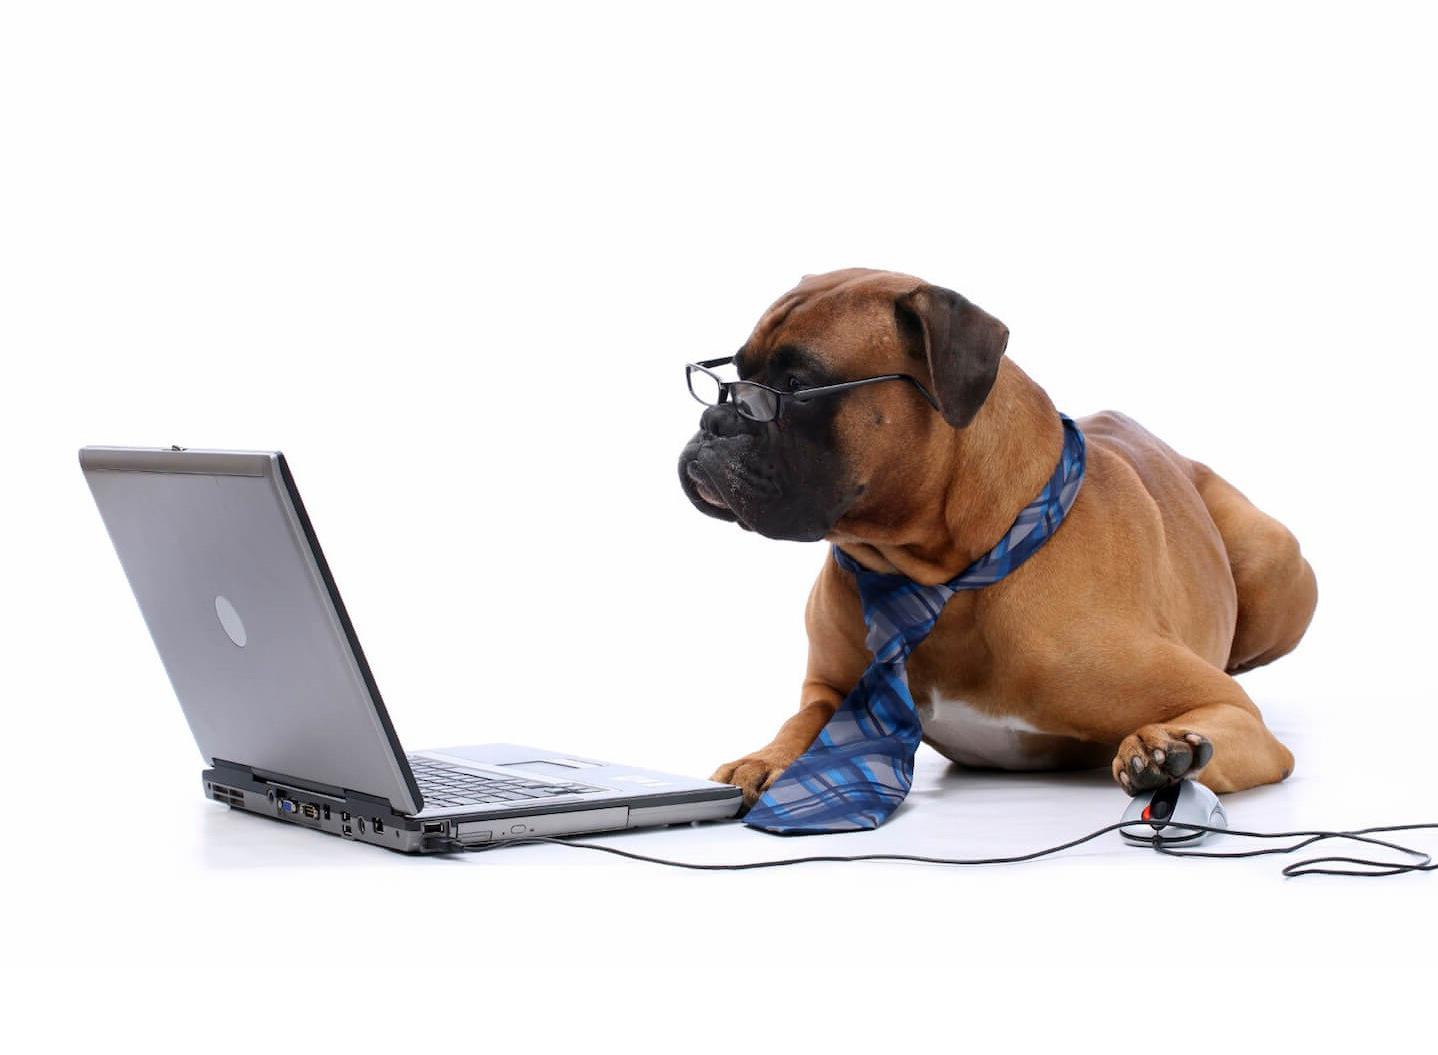 f912ab136398028b17b8d86a34d0fb8fd142a5ca_chien ordinateur